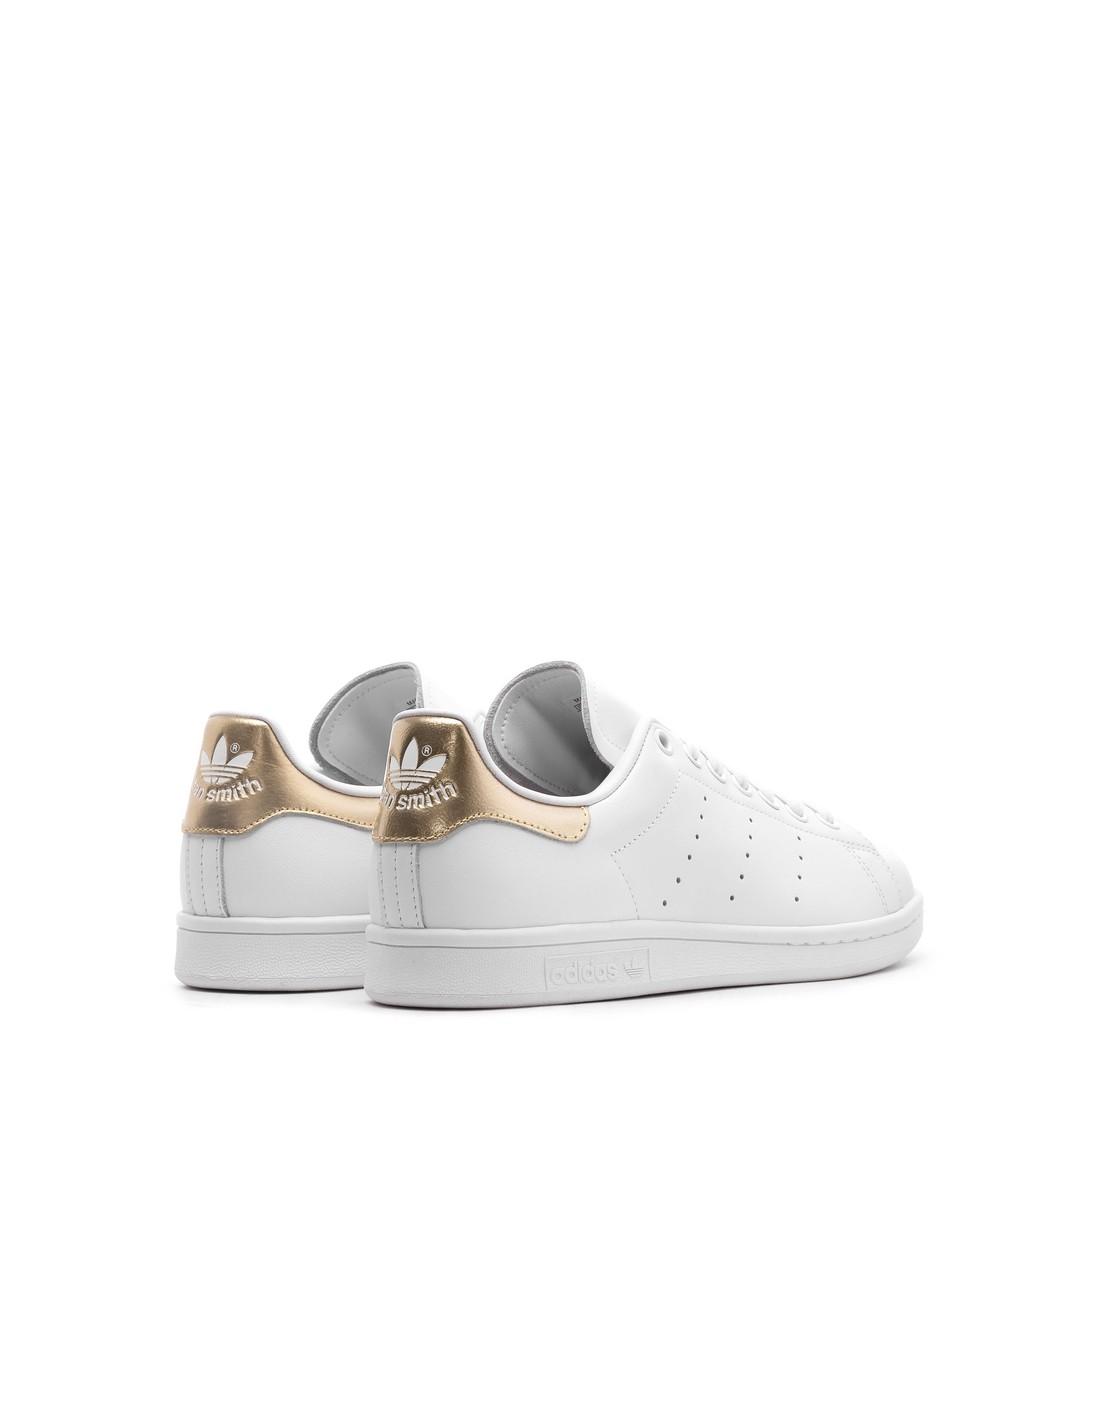 Adidas Stan Smith Women's Shoes WhiteGold (EE8836